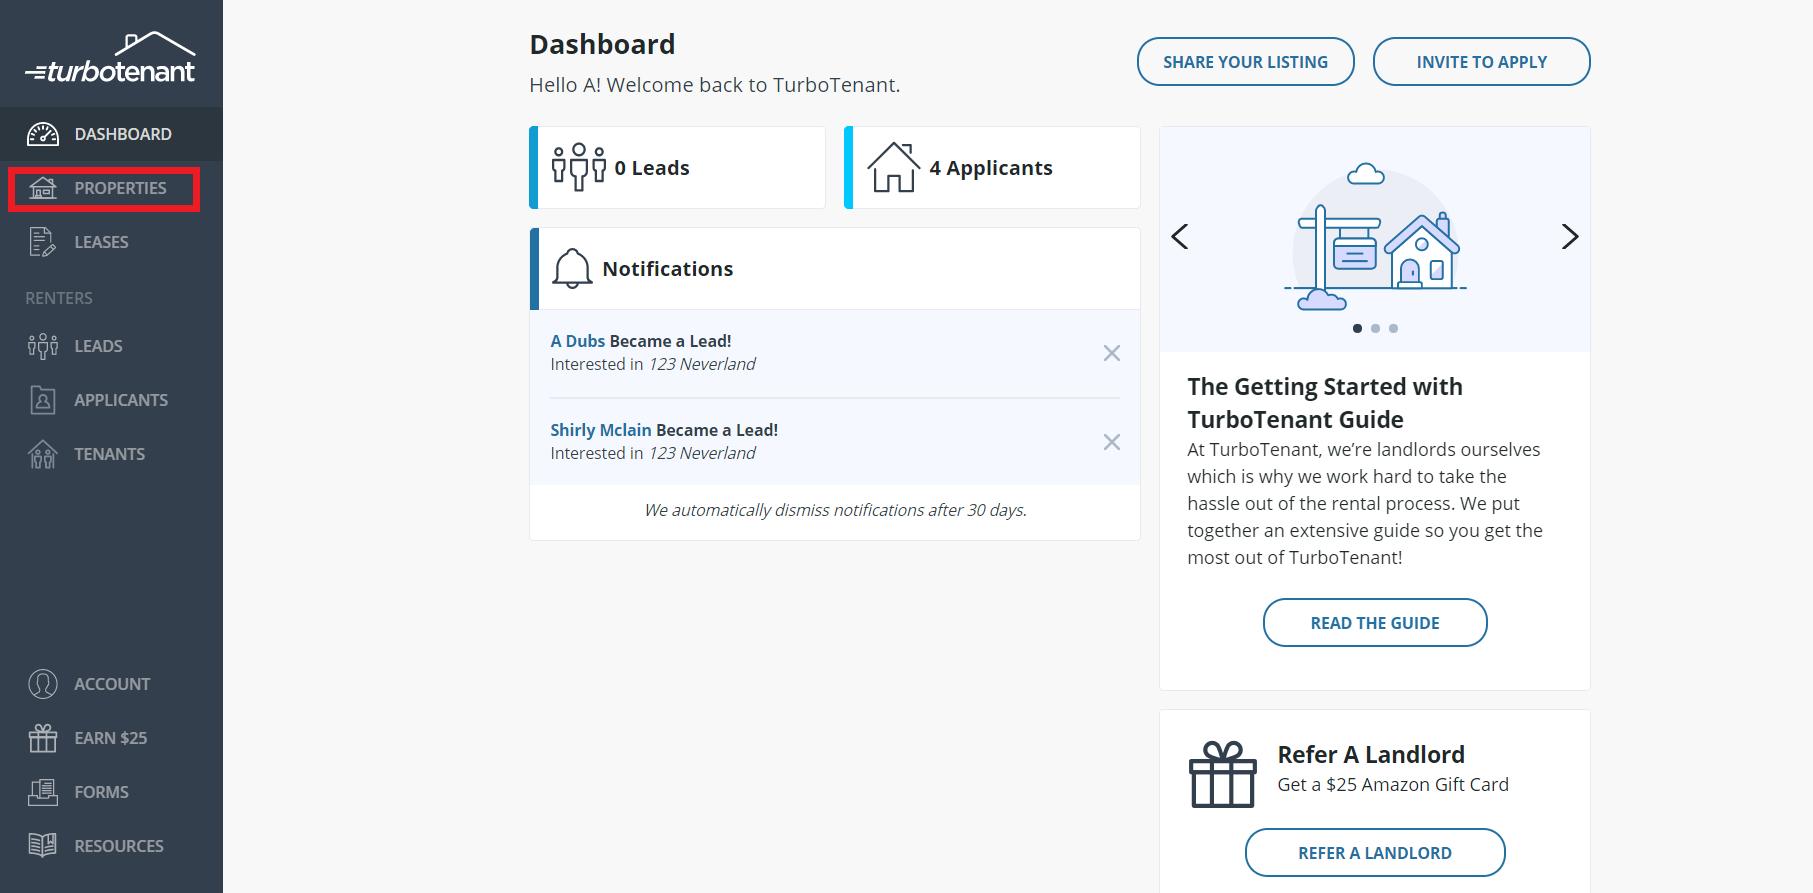 dashboard_-_properties.png